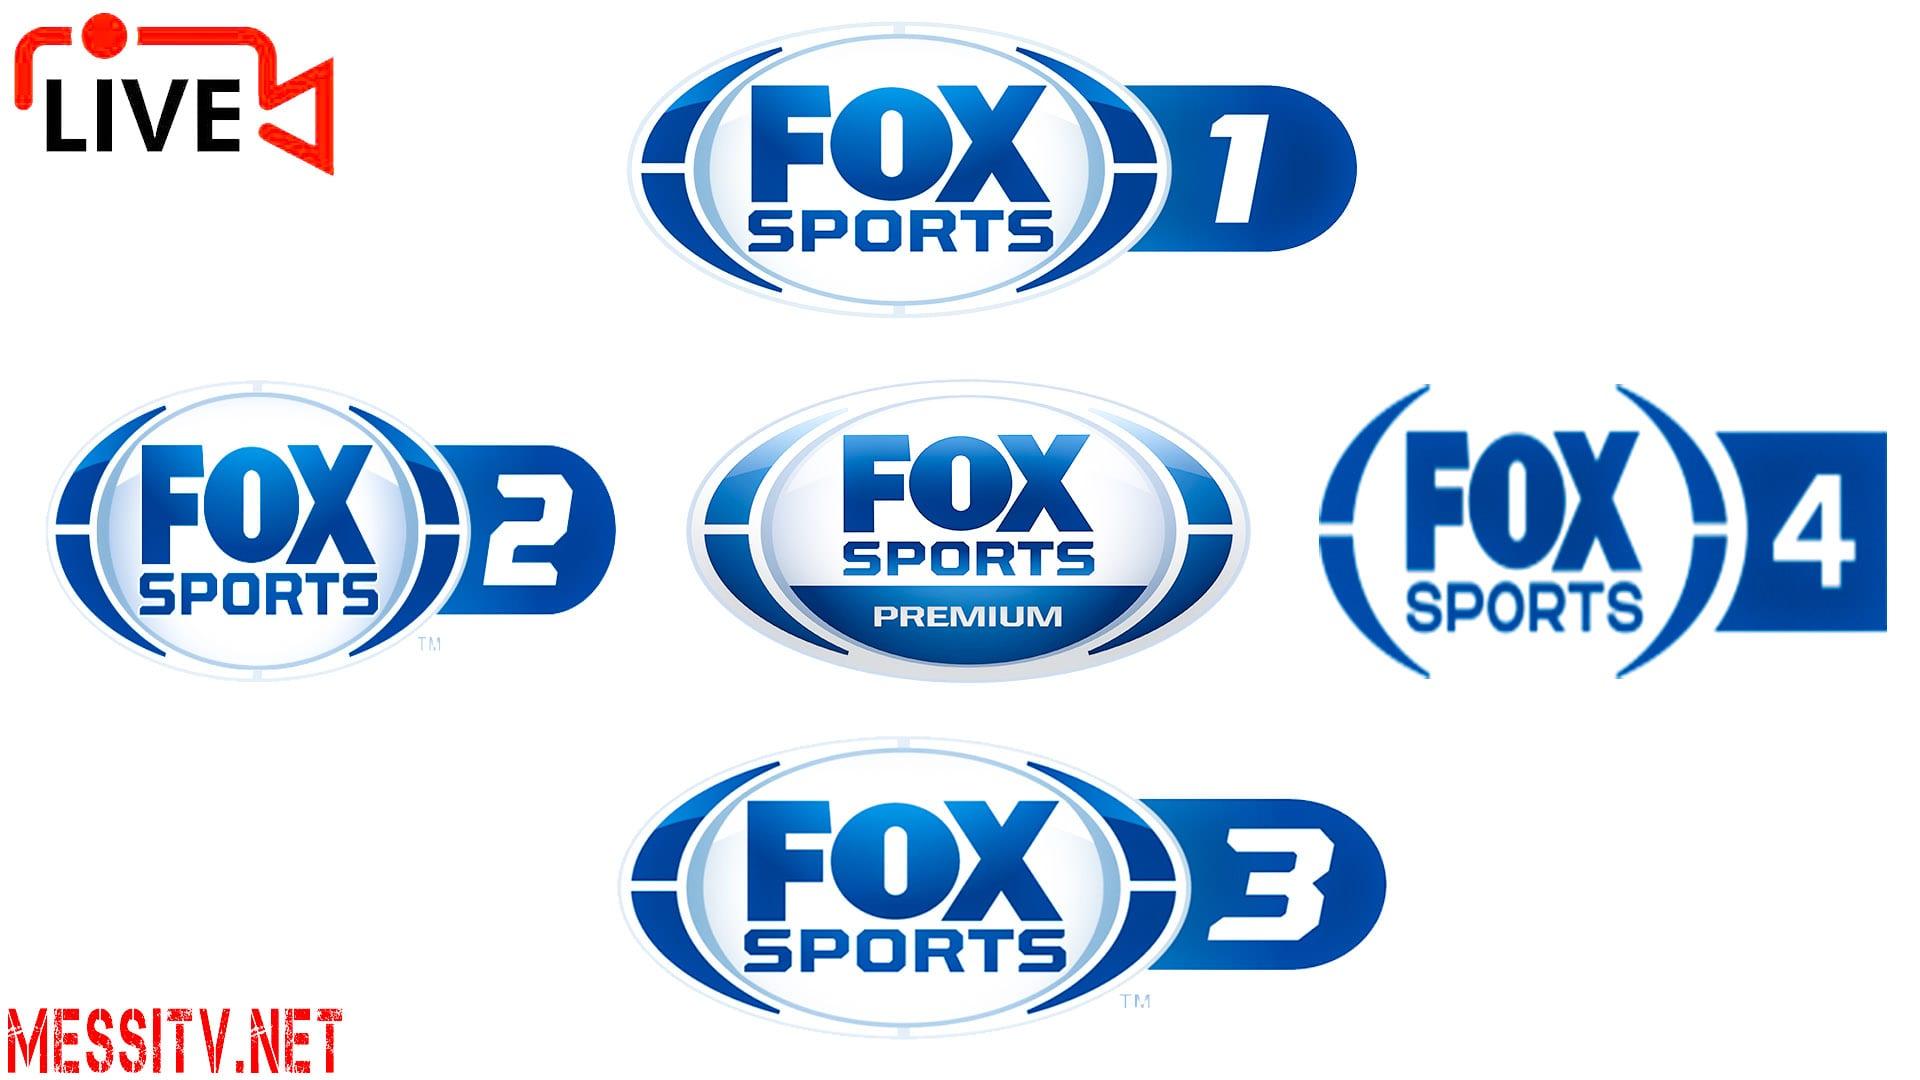 Fox Sports 1, Fox Sports 2, Fox Sports 3, Fox Sports 4 Fox Sports Premium, Fox Sports Brasil, Assistir Brasil TV ao vivo online